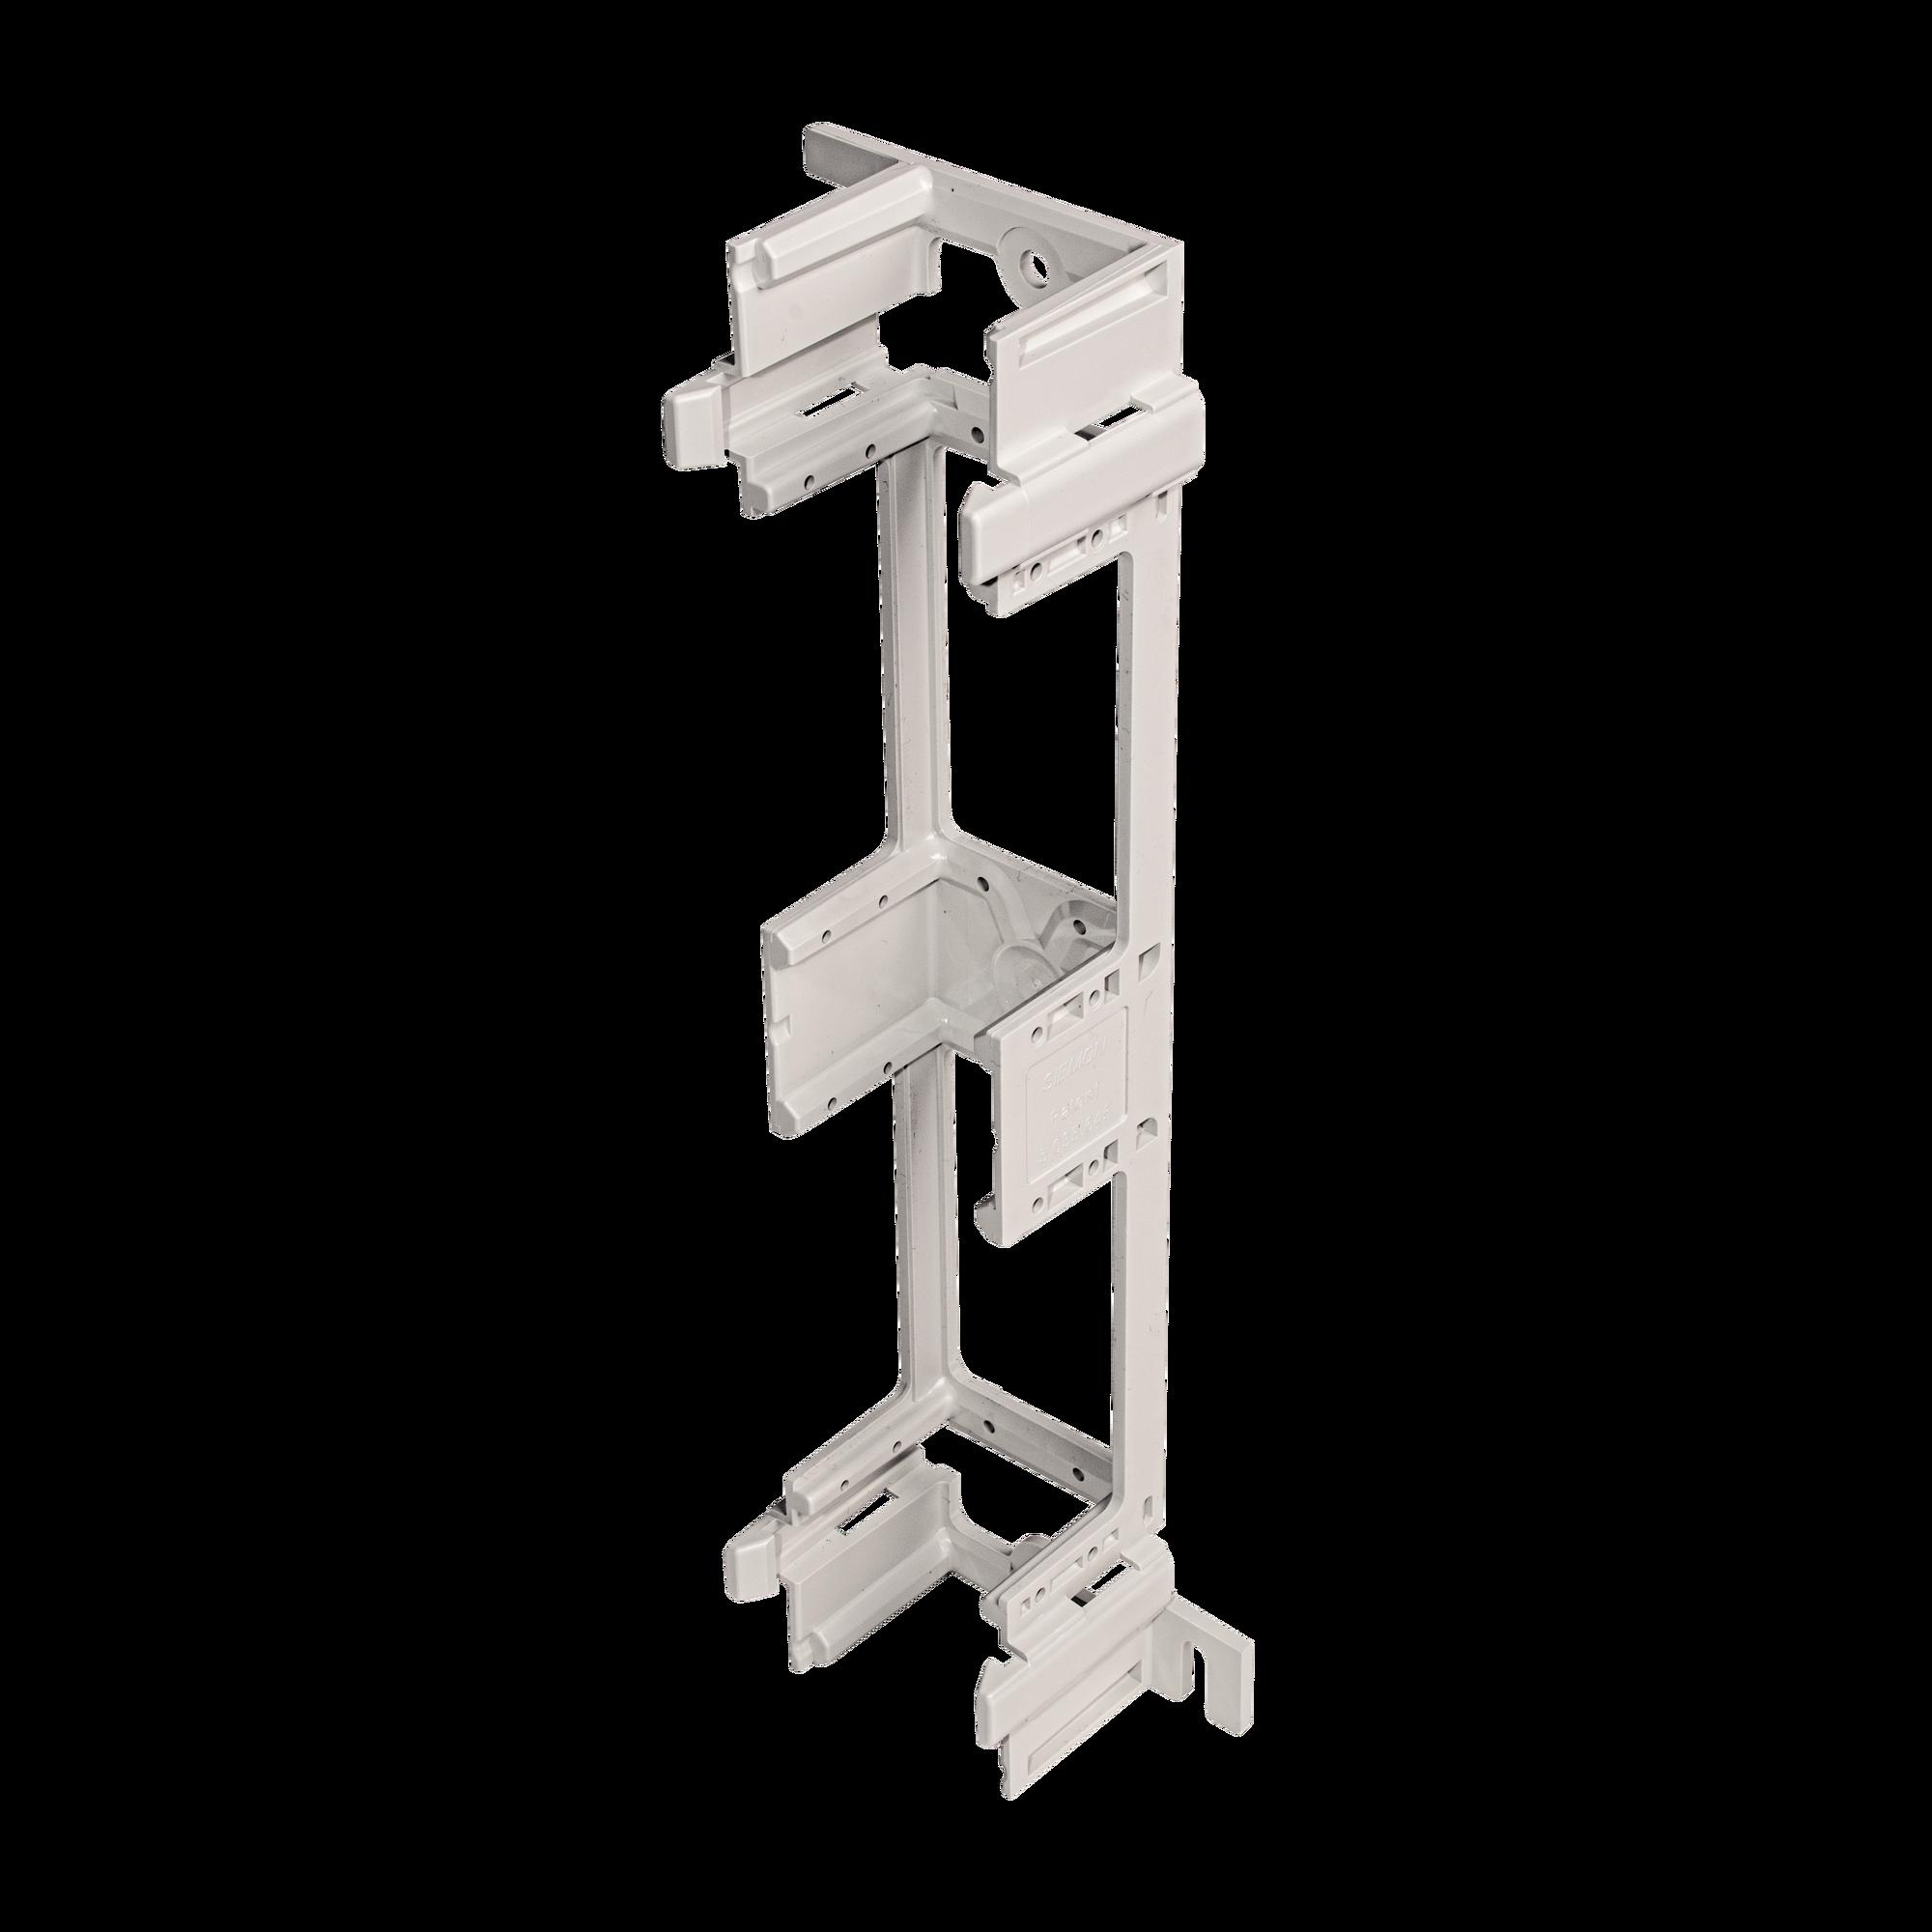 Bracket para Montaje de Regleta S66, Acepta 1 regleta M150, 6 conectores de 25 pares